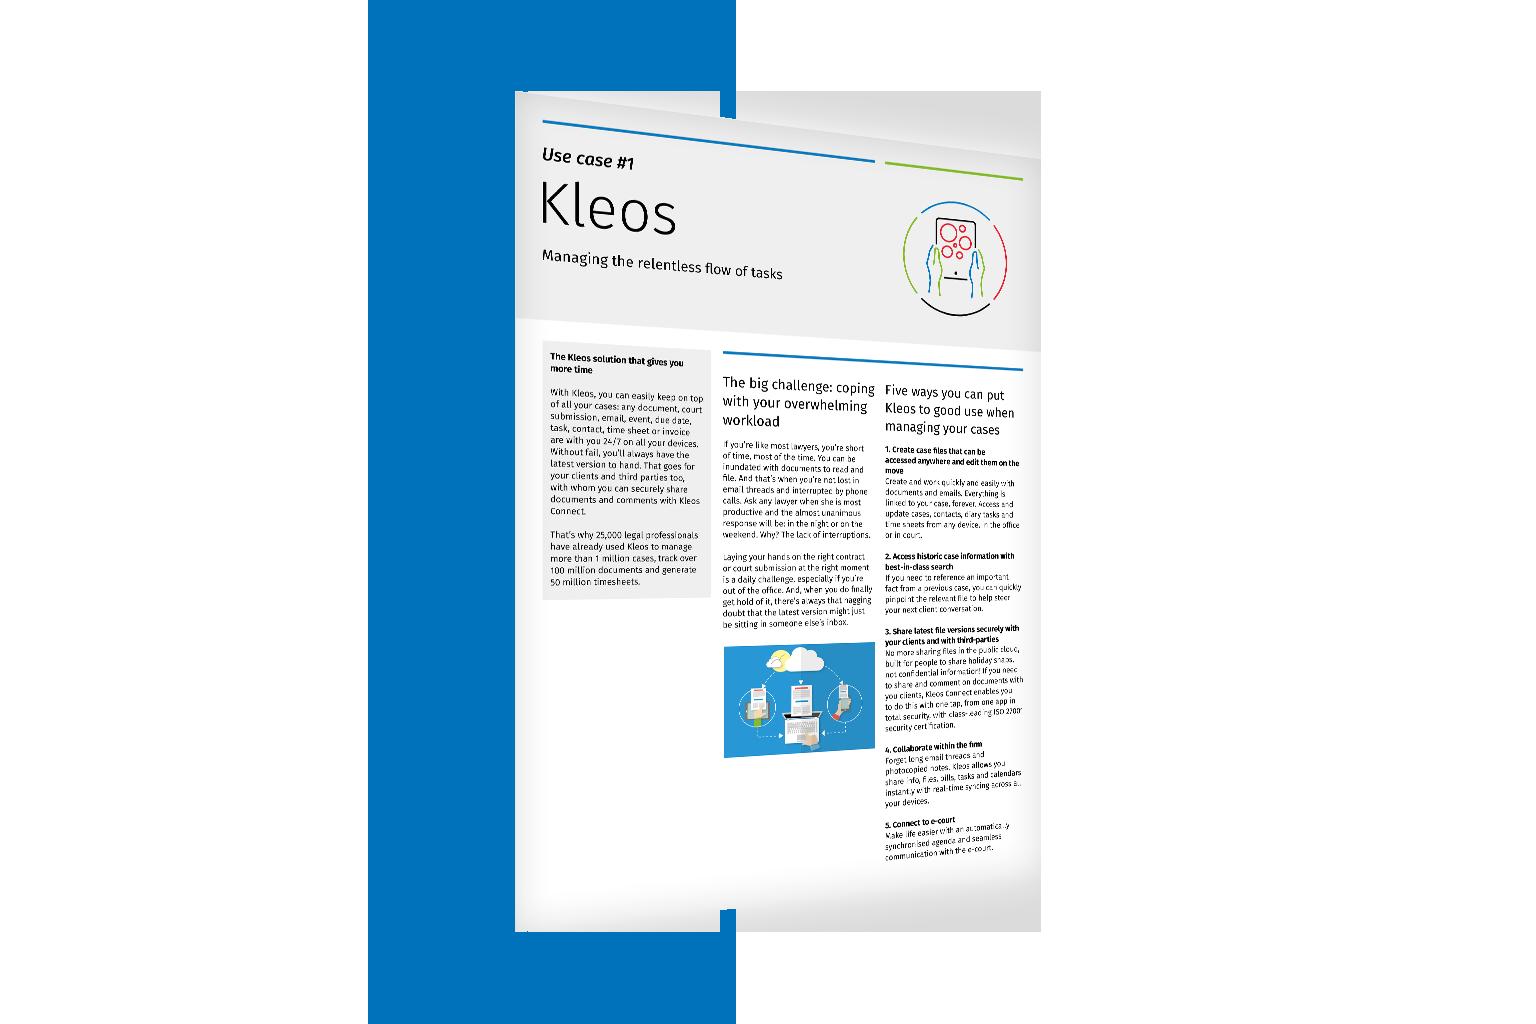 Kleos-Use-Case-1-Managing-Tasks-EN-EU-1536x1024